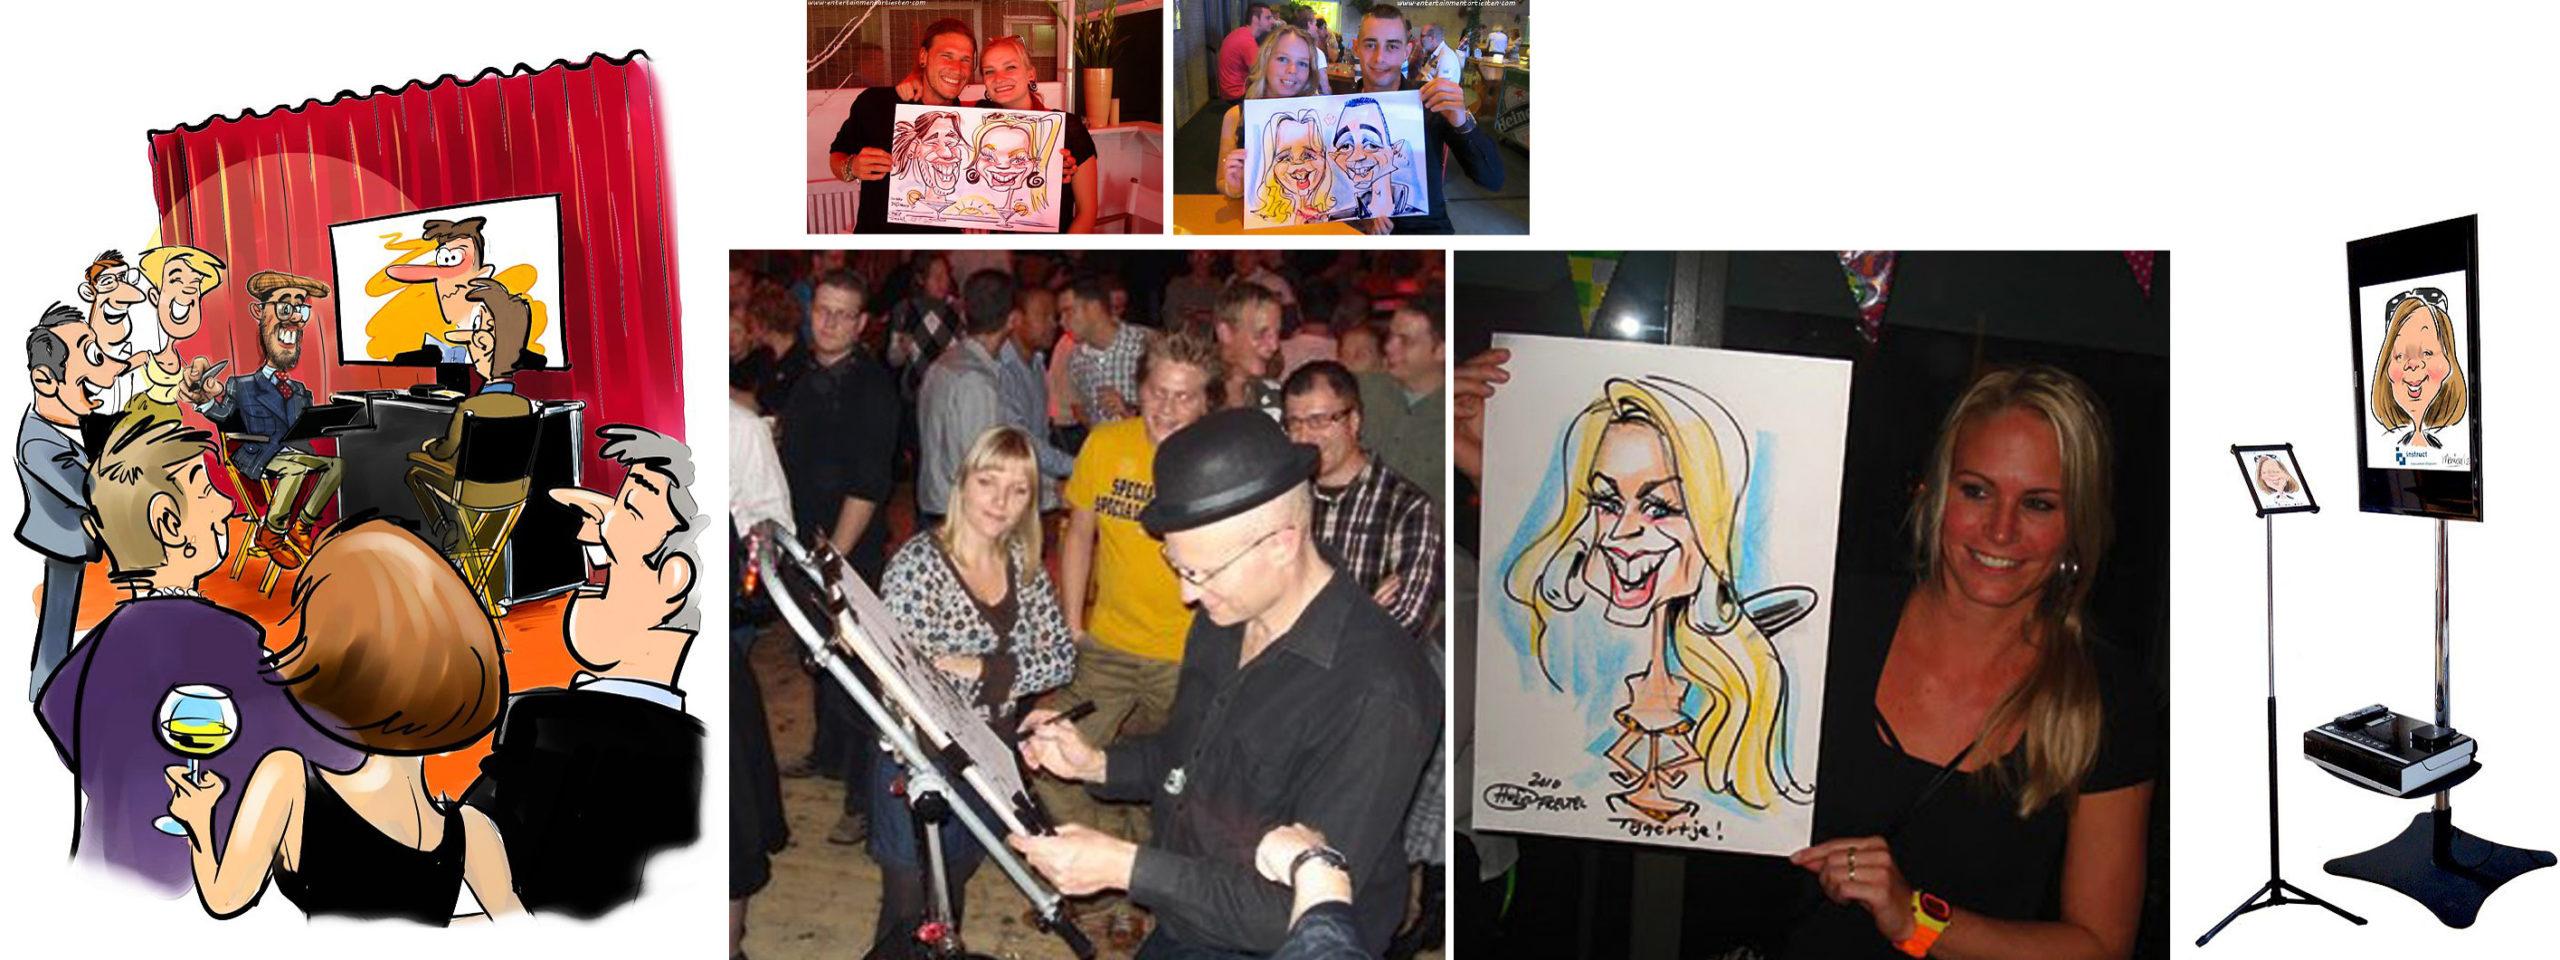 Sneltekenaar- karikaturist, karikatuur portretten, portret, thema feest, evenement organiseren, artiesten boeken, artiestenburo, artietenbureau, beurs- en promotie acts, evenementenbureau, entertainment, tekeningen, portret tekenen, Govers Evenementen, www.goversartiesten.nl